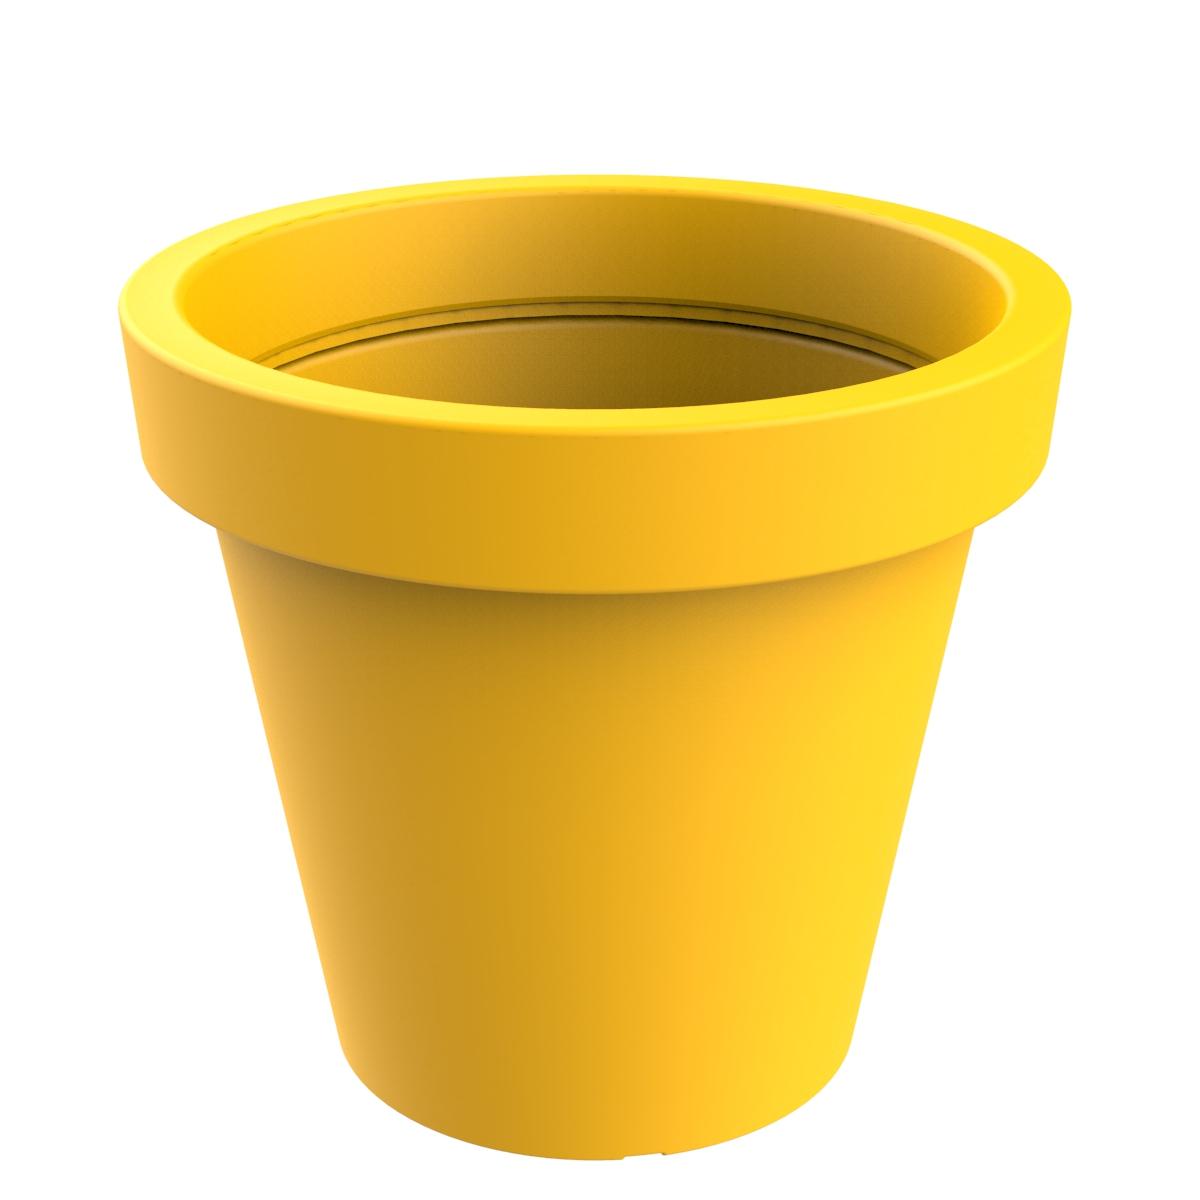 Jardinière modèle Alvium jaune RAL 1021 P-1017-1200-AMA